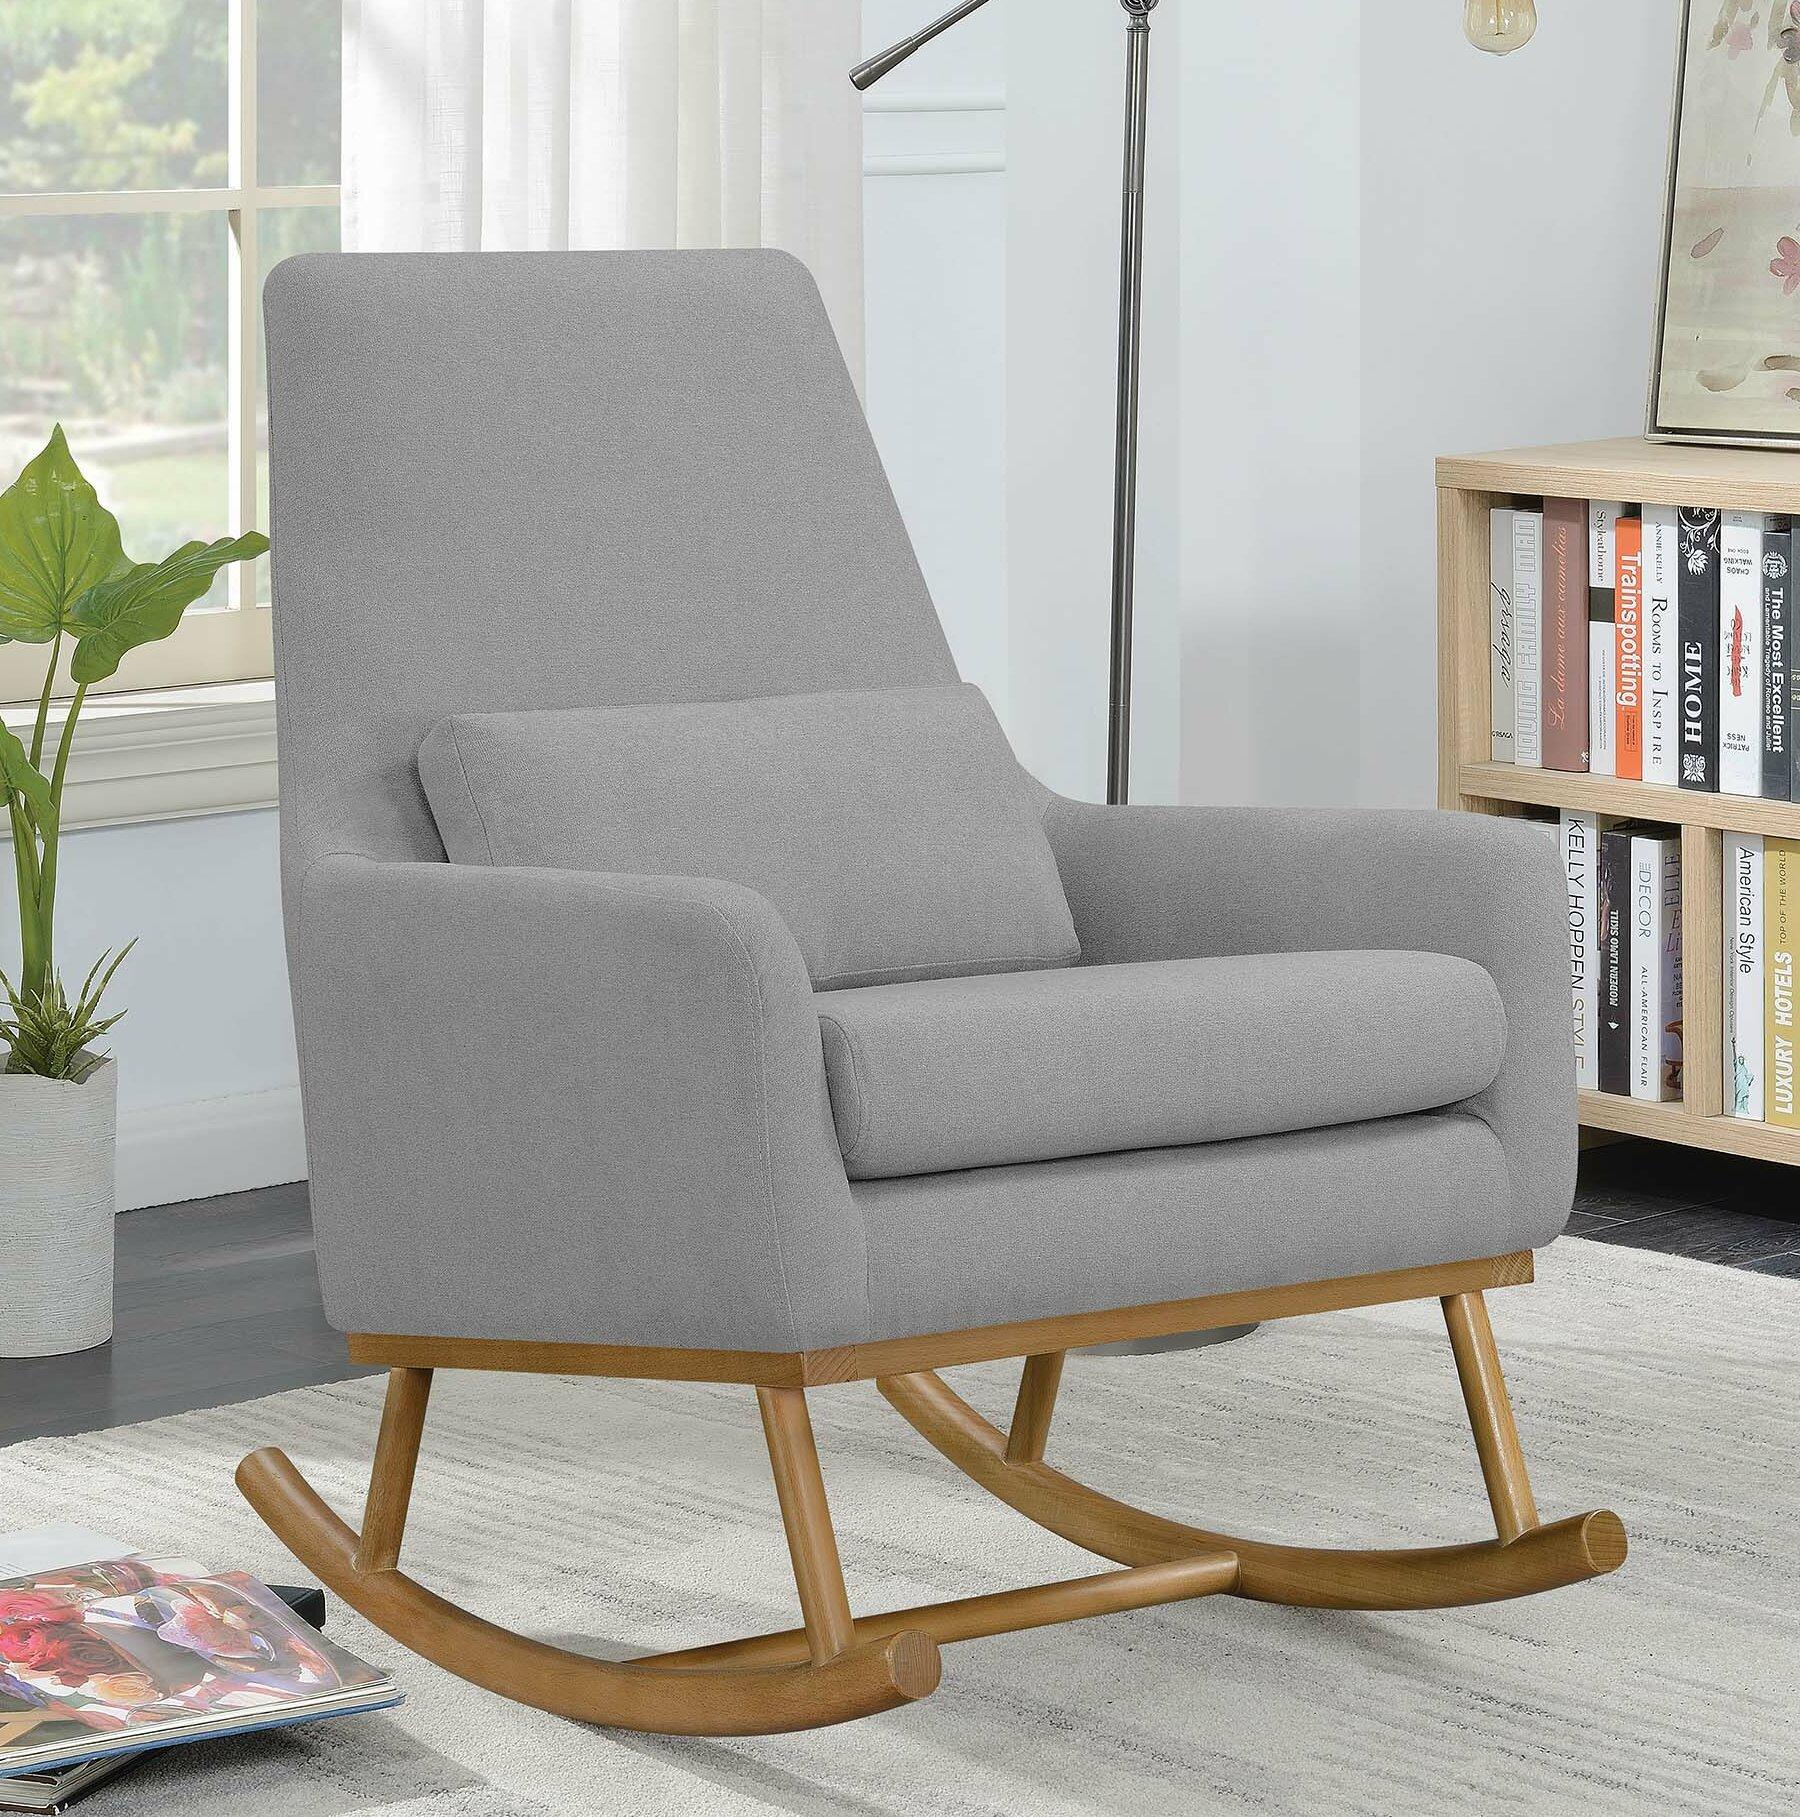 Amazing Langport Rocking Chair Download Free Architecture Designs Scobabritishbridgeorg